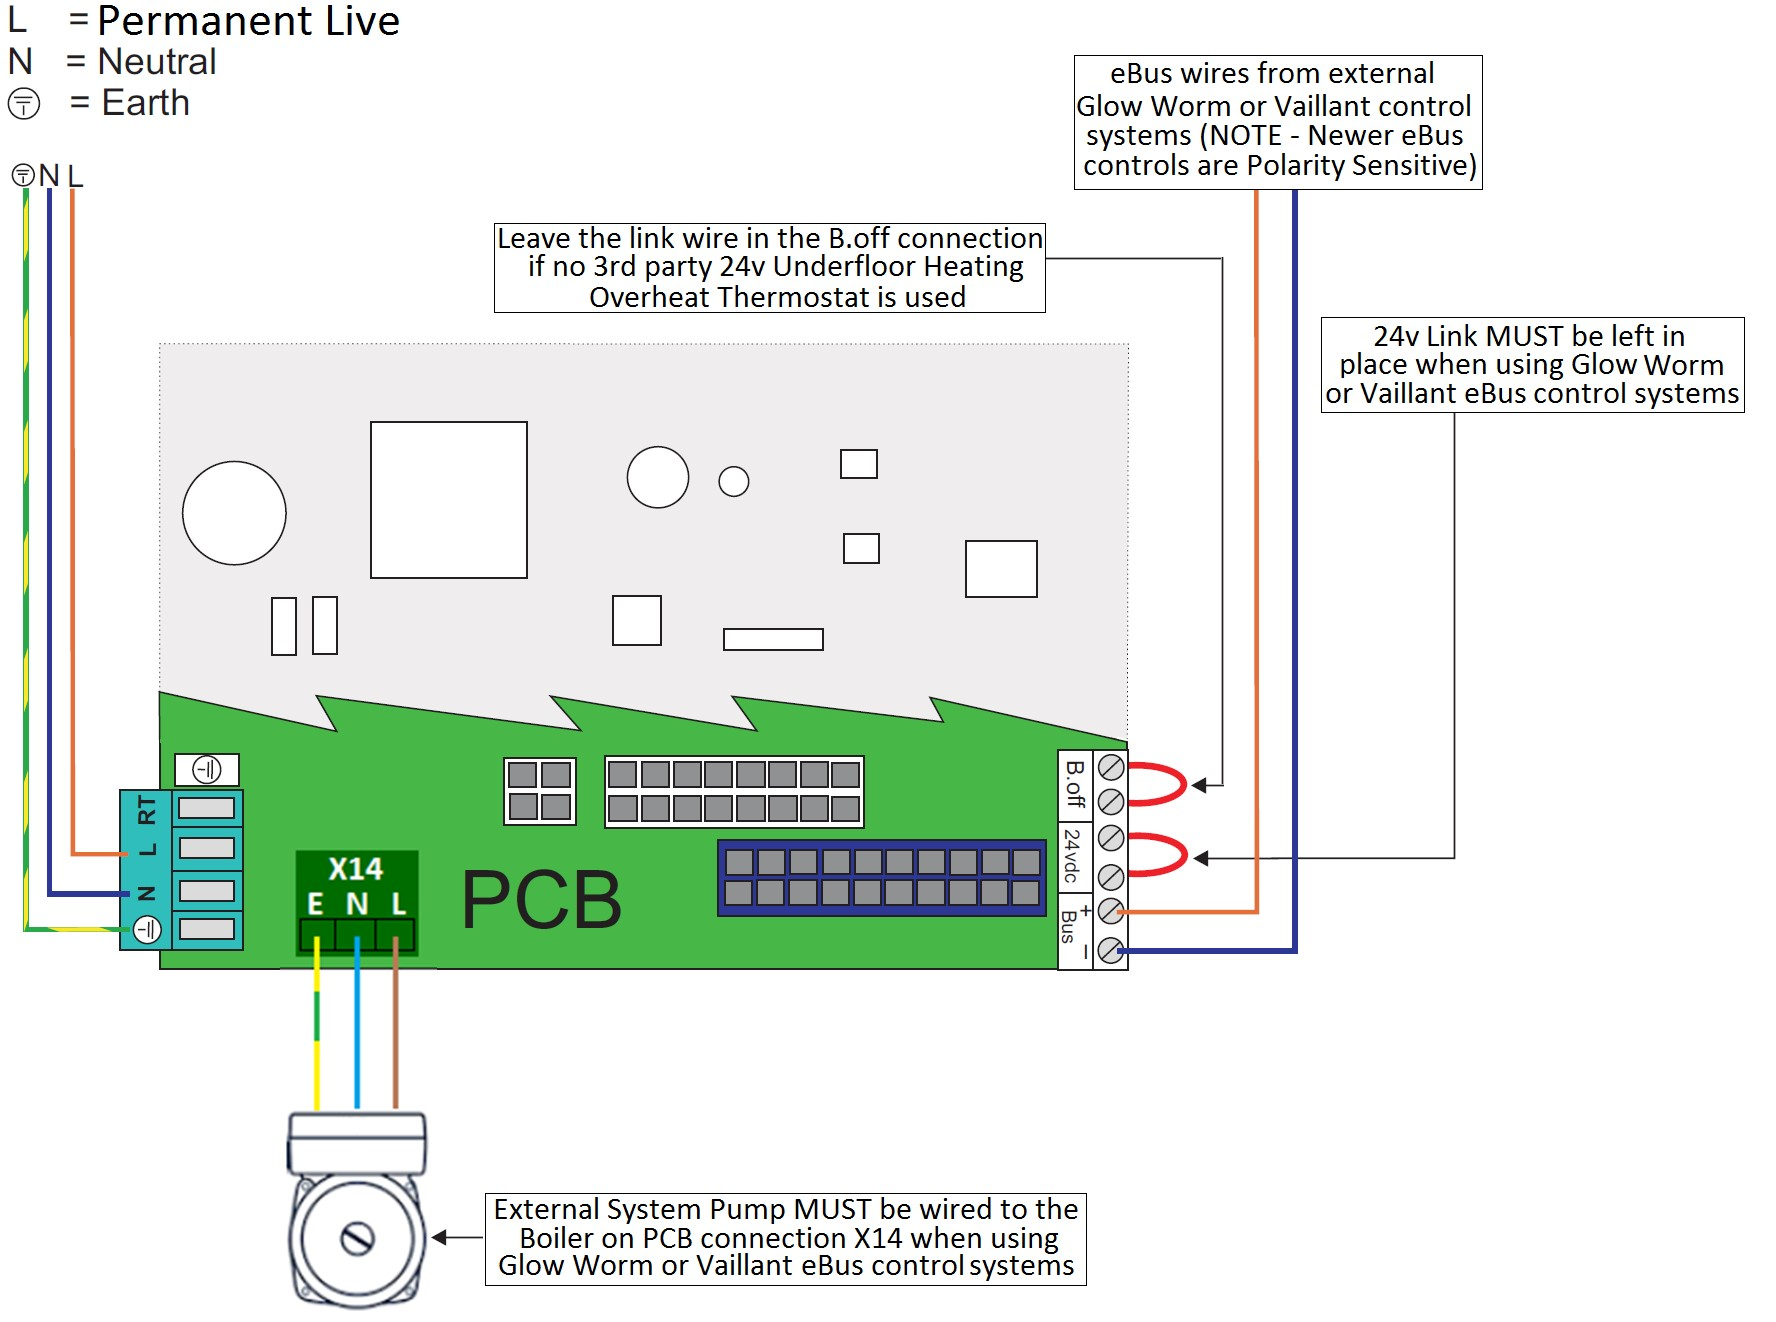 underfloor heating wiring diagram combi boiler the cask of amontillado story ask vaillant domestic boilers